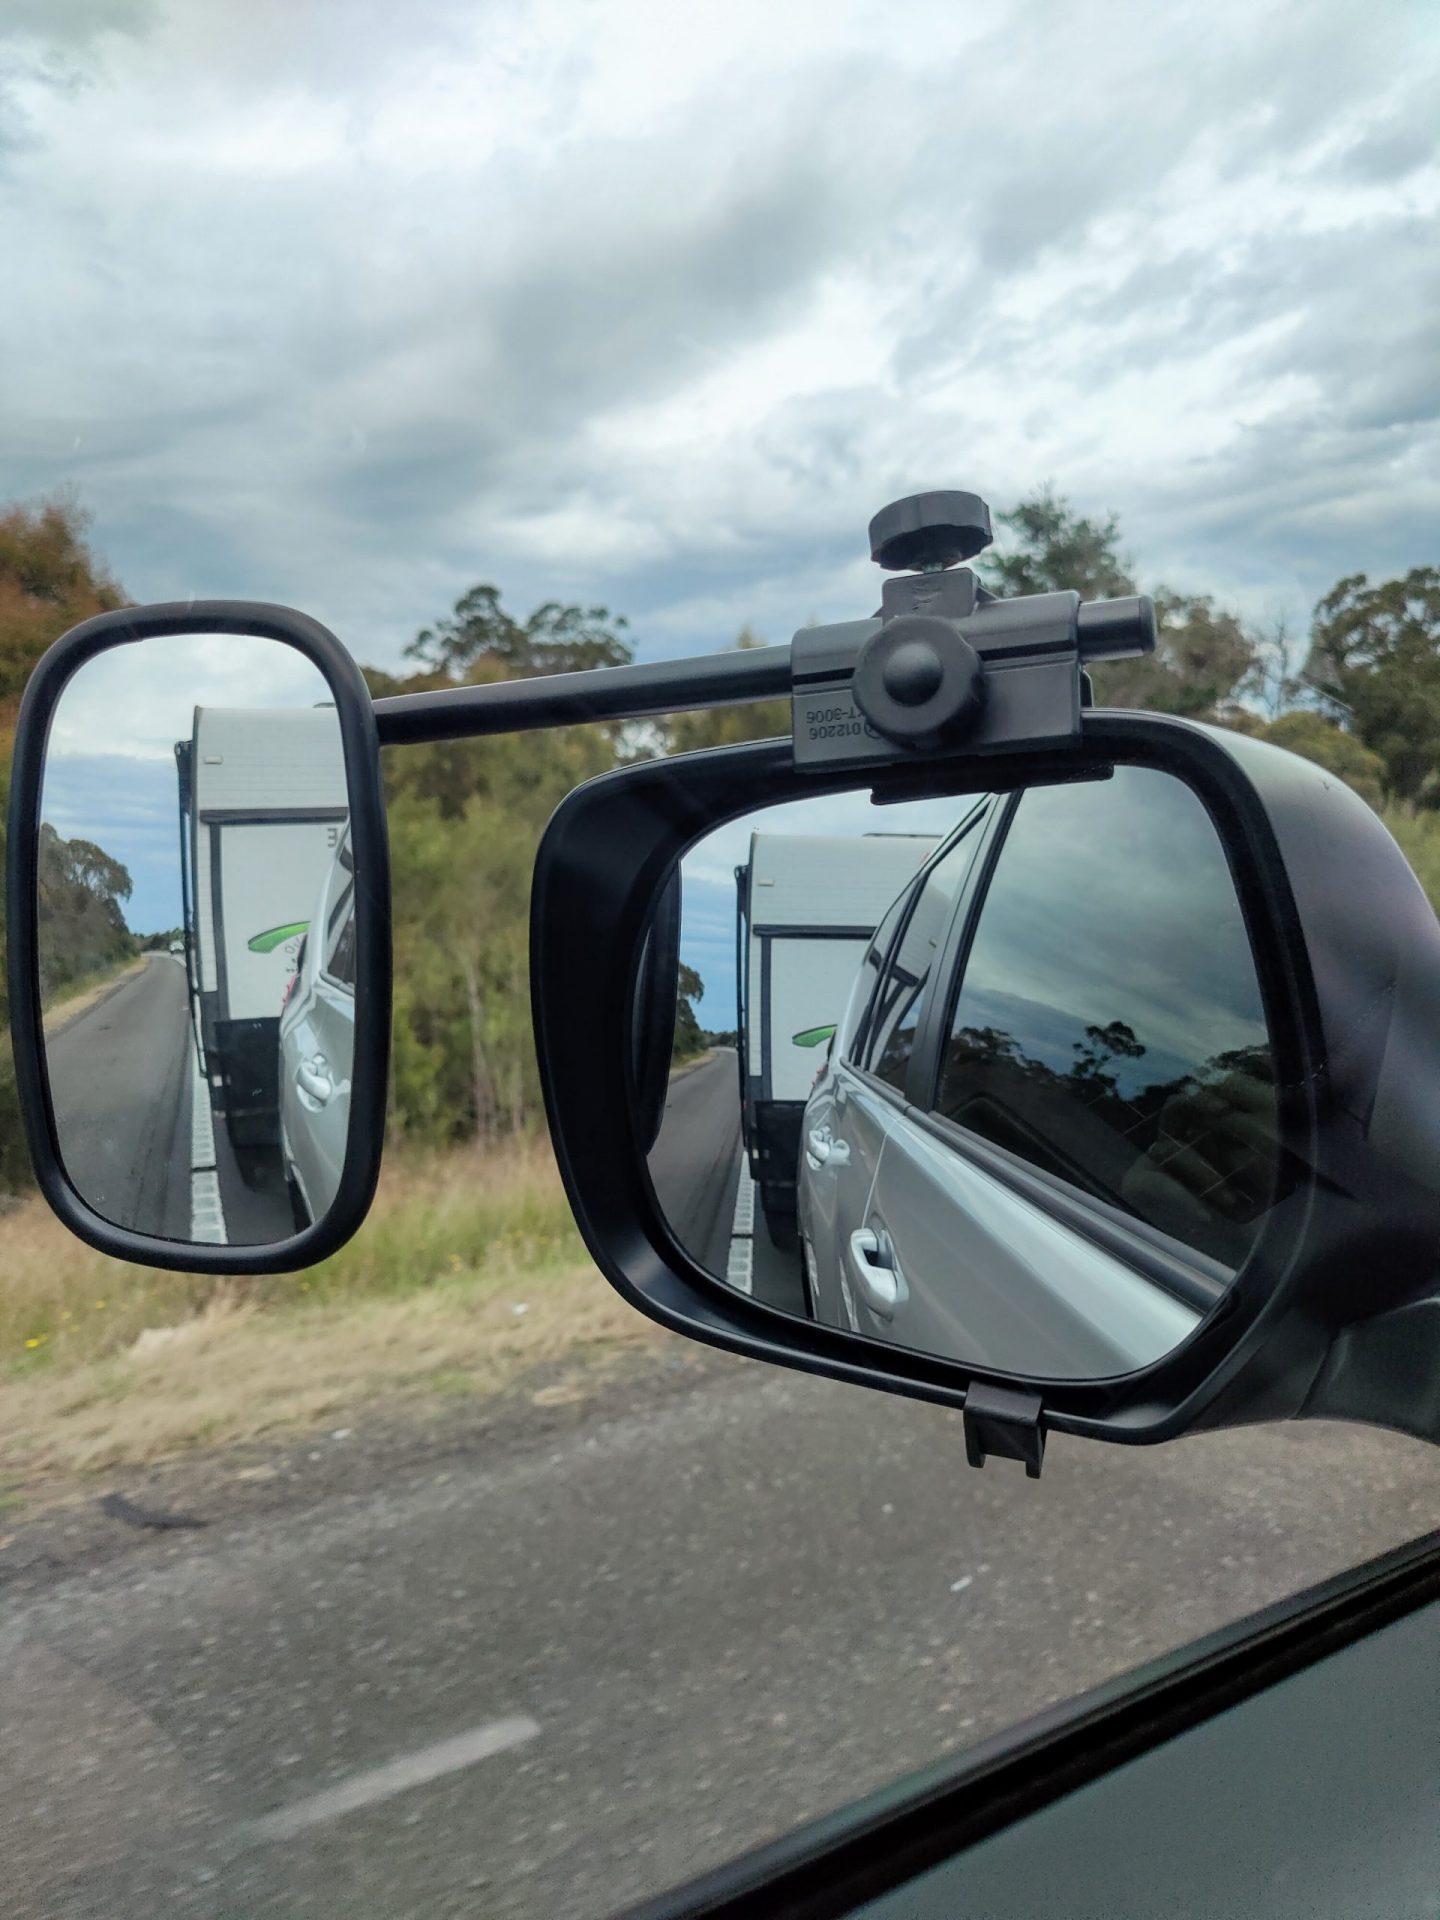 The Best Caravan Towing Mirrors in Australia